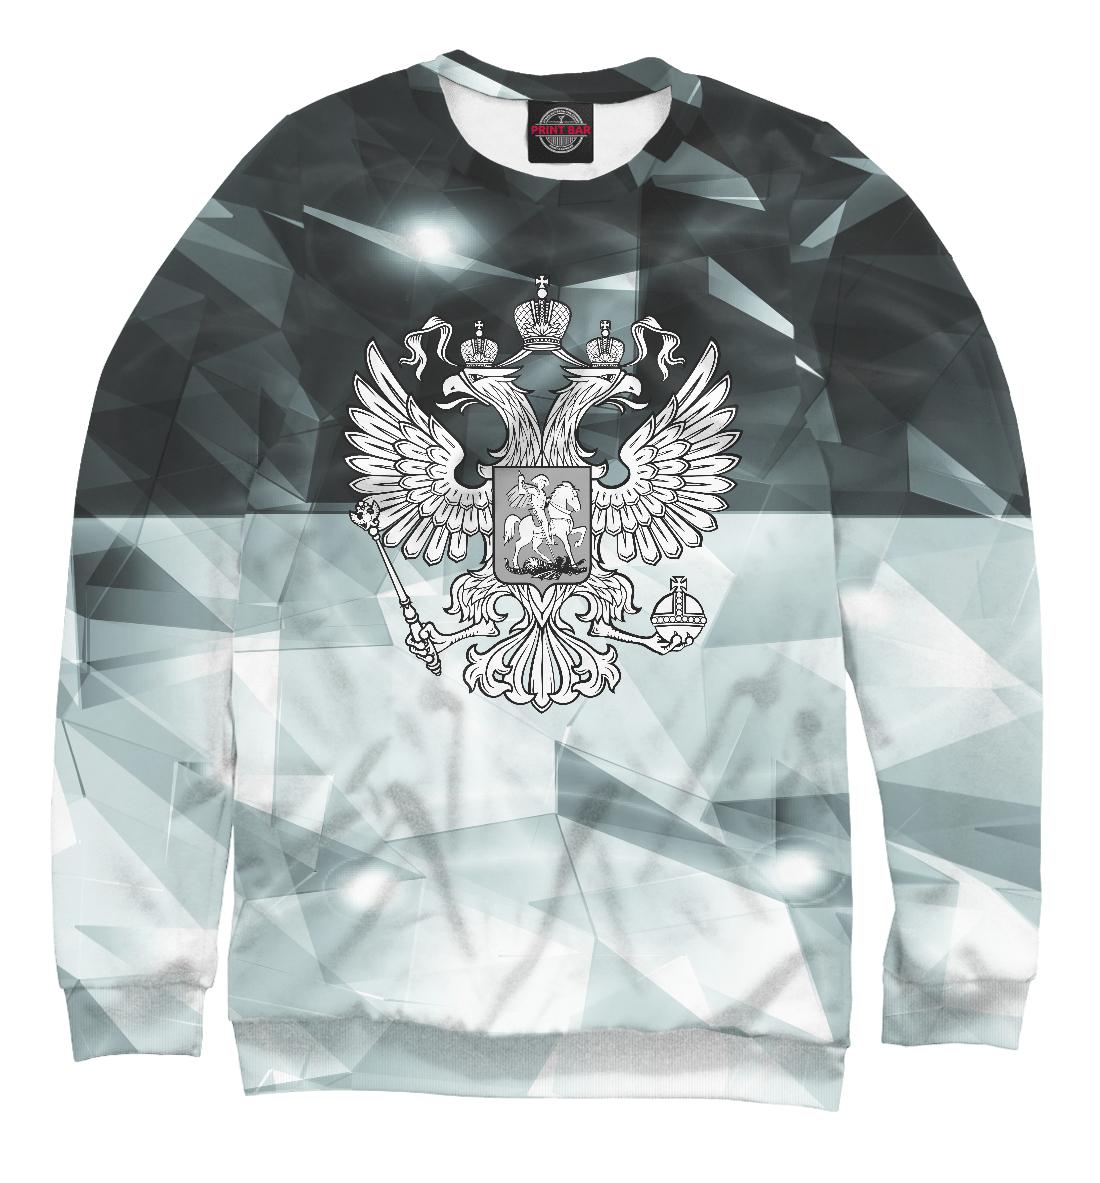 Купить Герб России Black&White, Printbar, Свитшоты, SRF-678654-swi-2